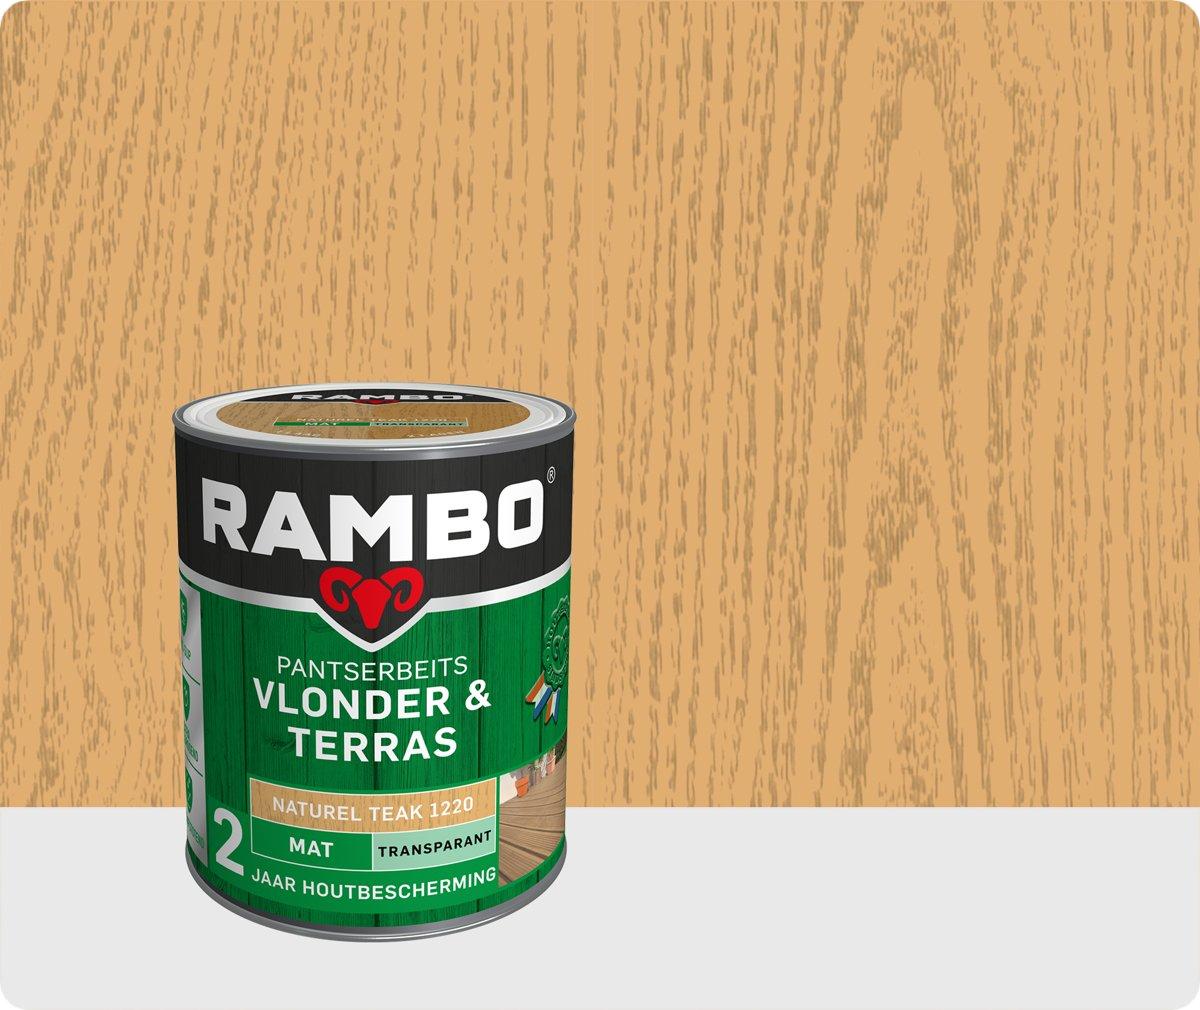 Rambo Vlonder & Terras pantserbeits mat transparant 1220 1 l kopen